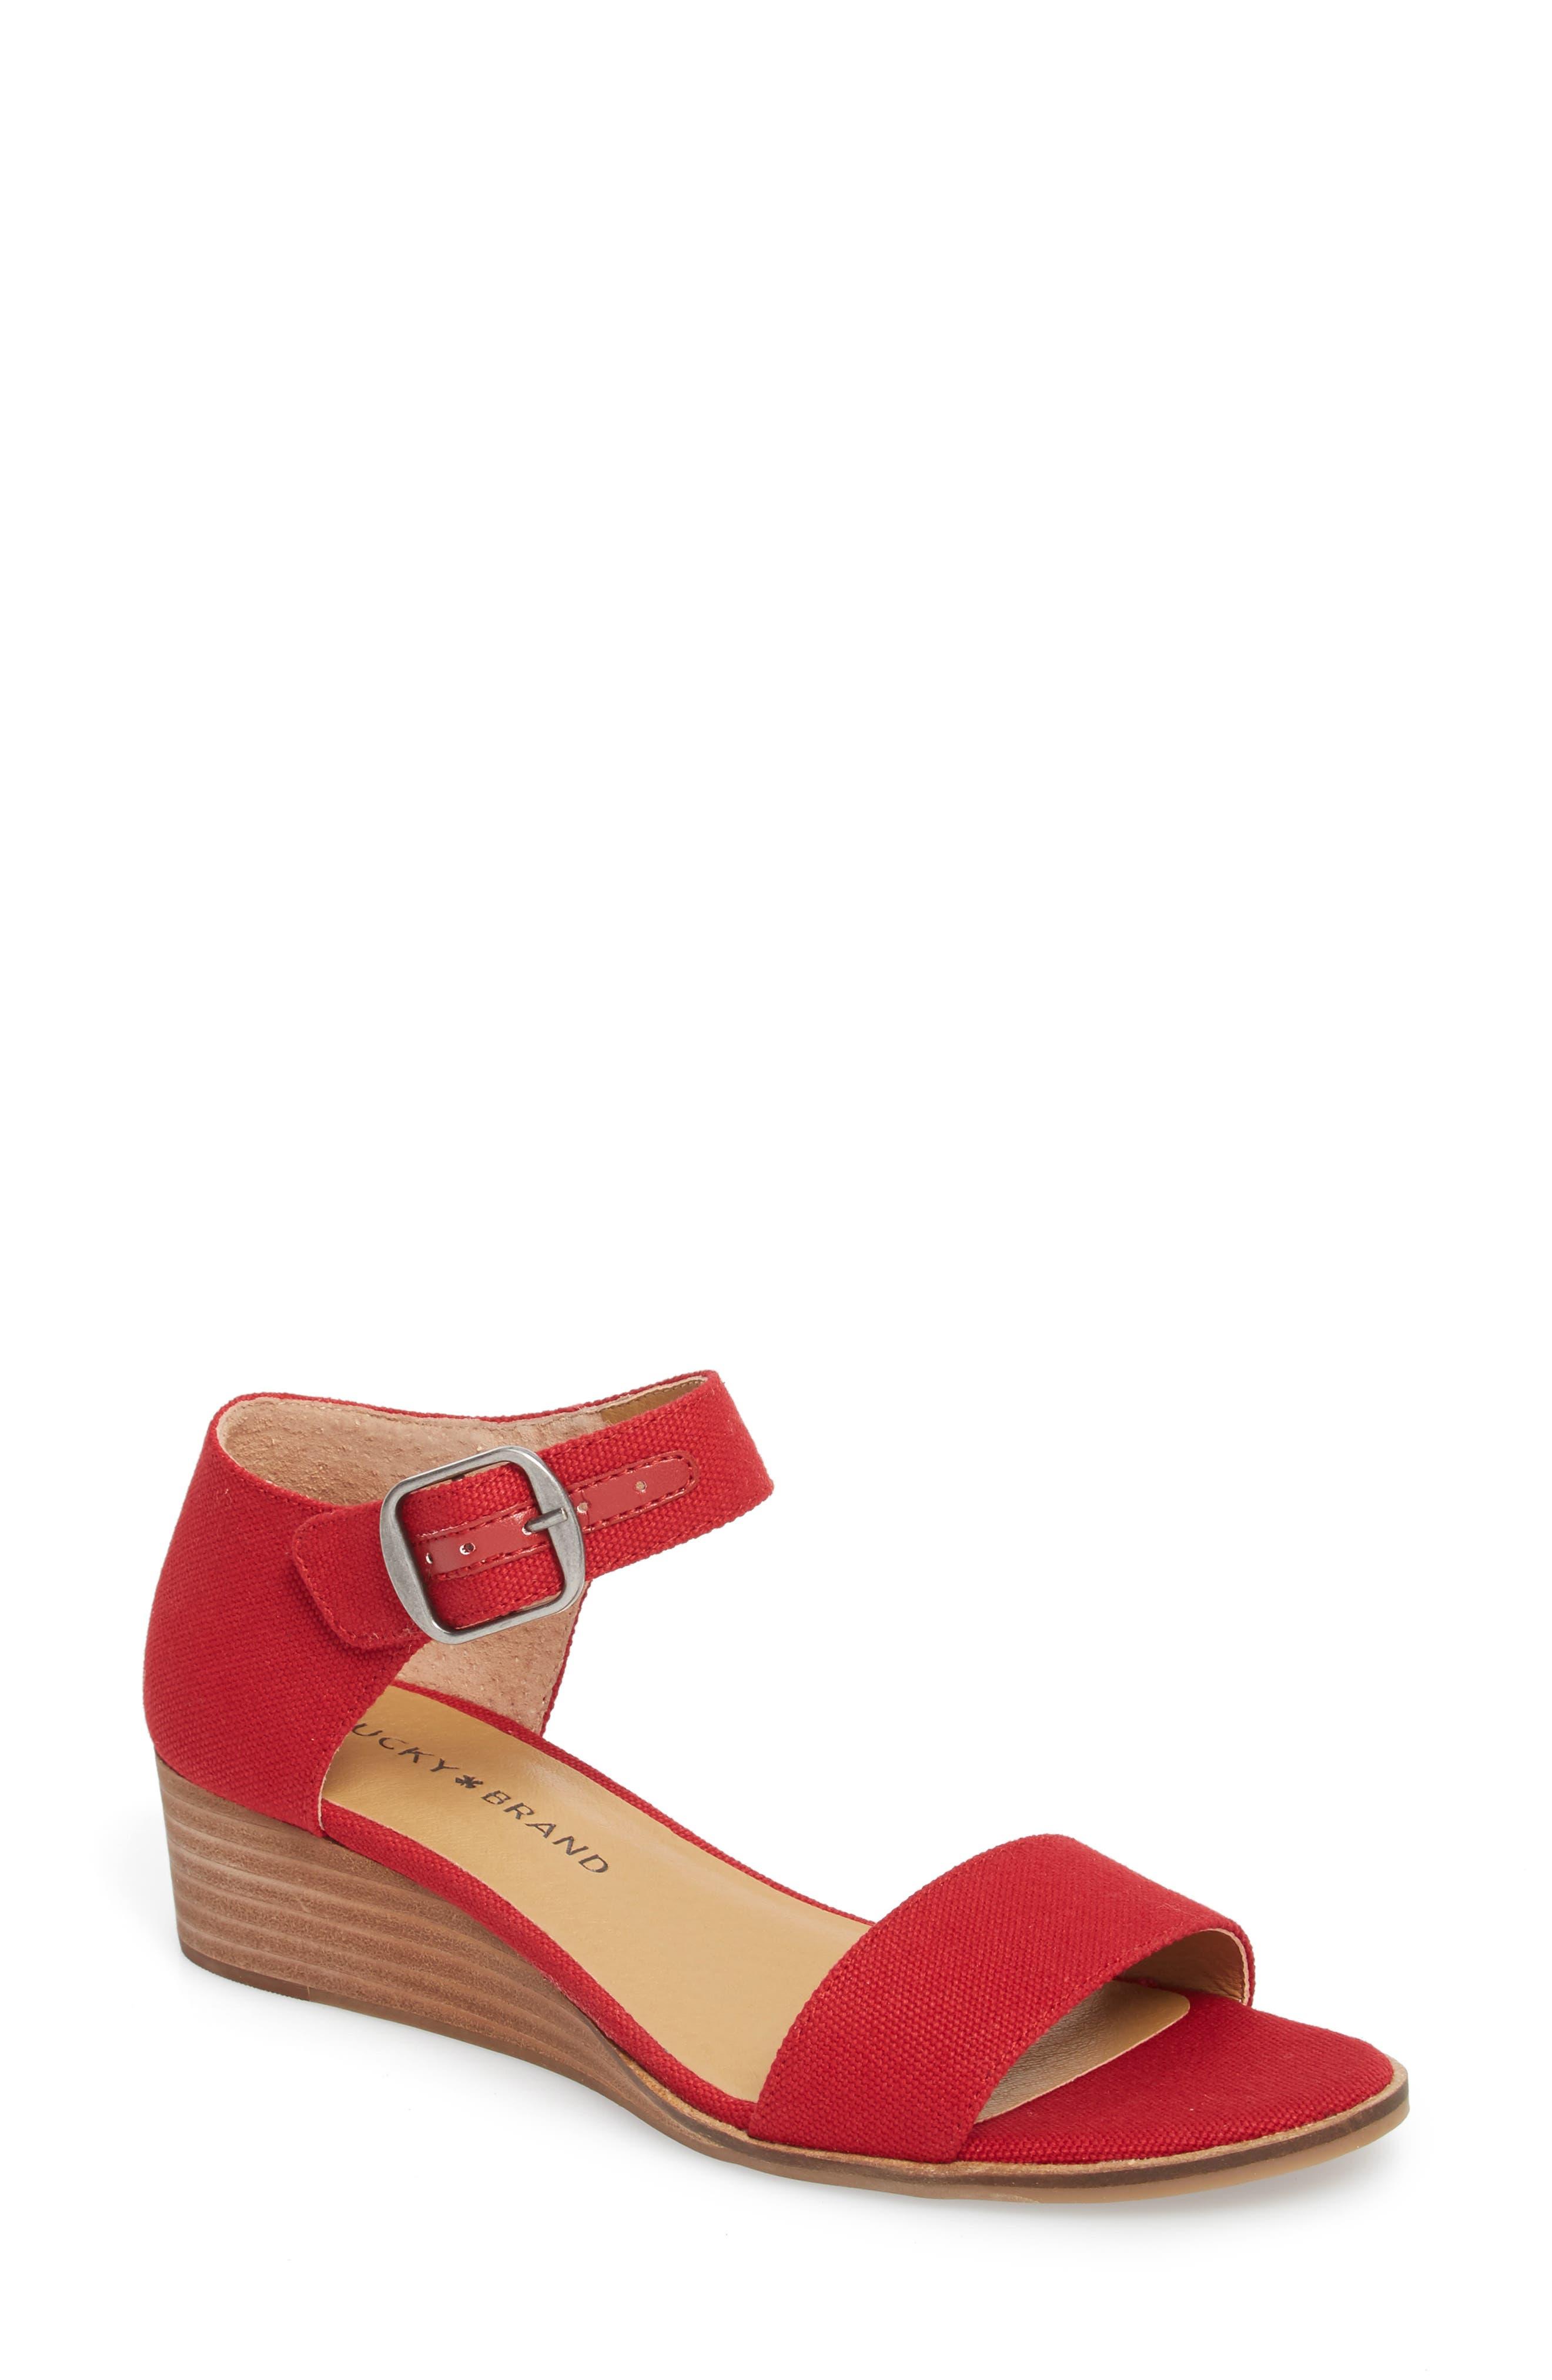 Riamsee Sandal,                             Main thumbnail 7, color,